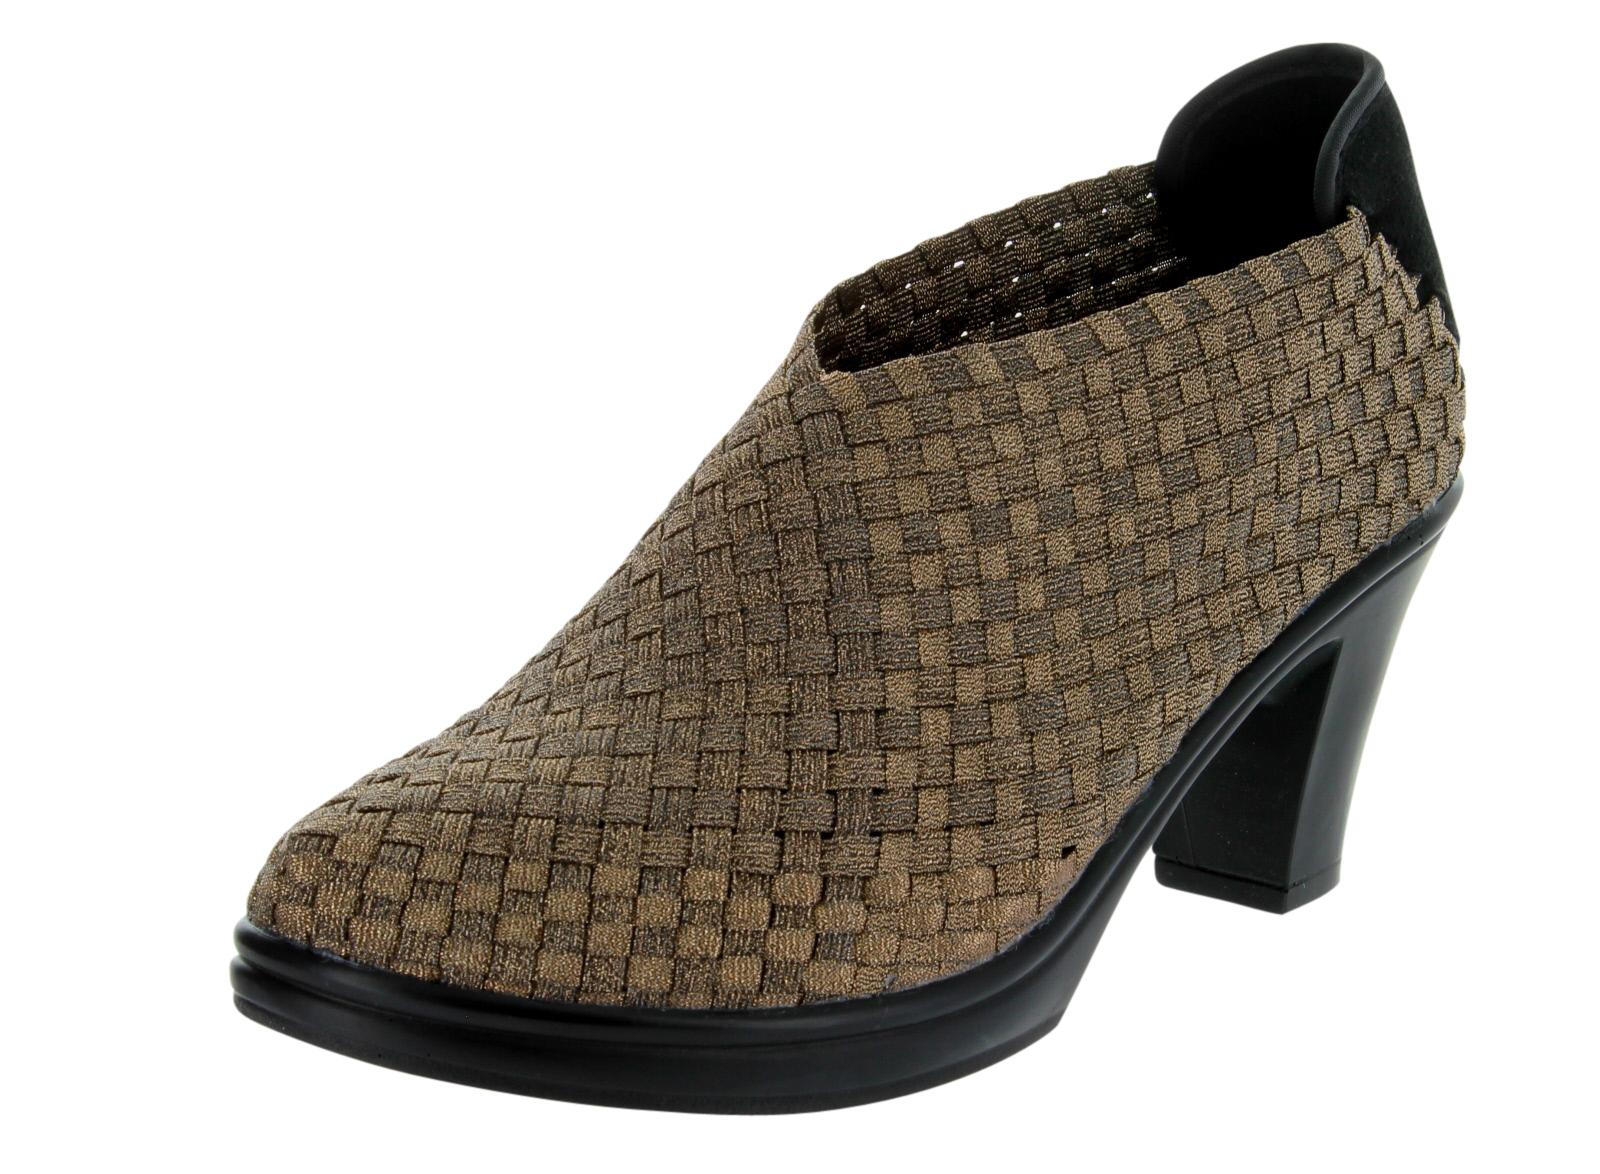 bernie mev womens chesca casual pumps shoes ebay